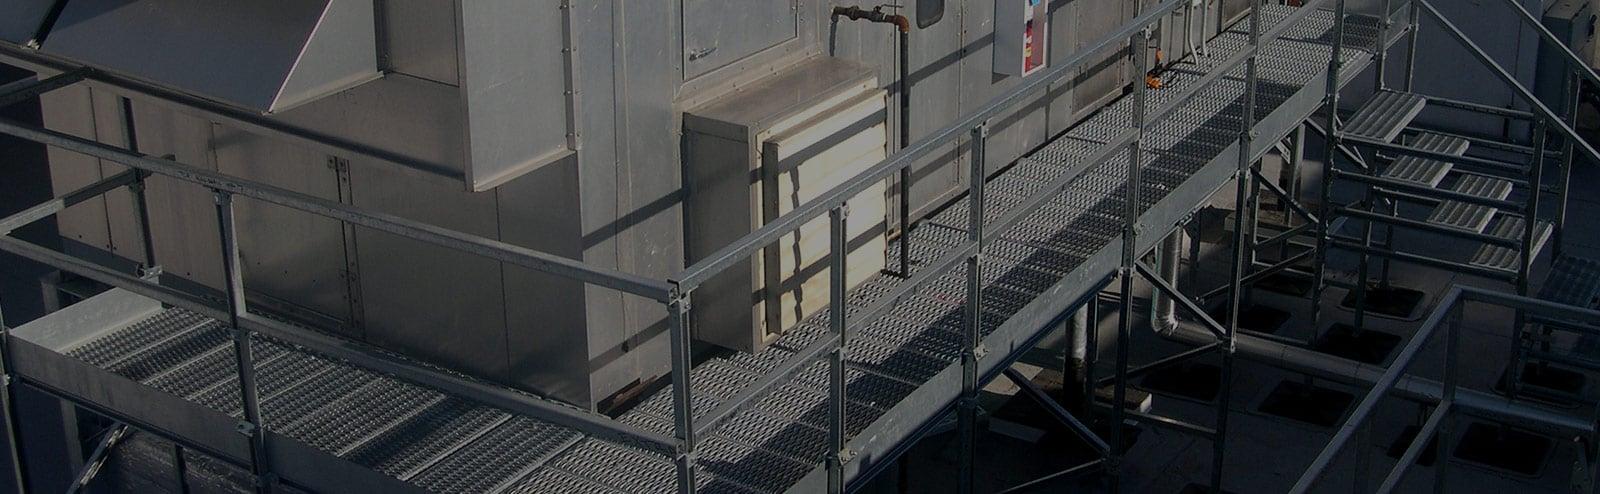 Roof Platform Systems